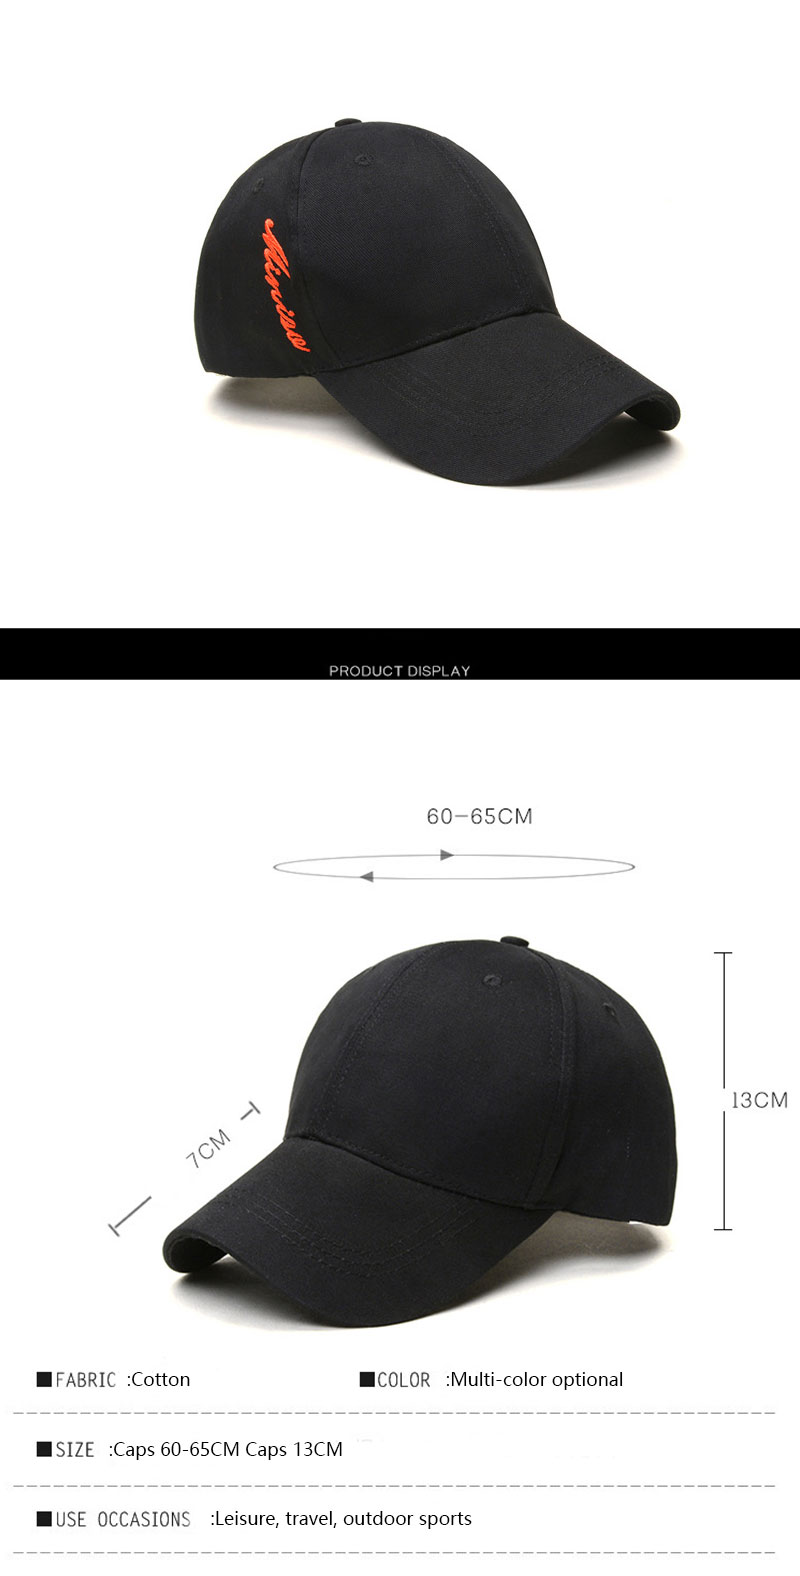 New Tyle Golf Caps Neutral Outdoor Sports Visor Running Hats Student ... e724684e5be4